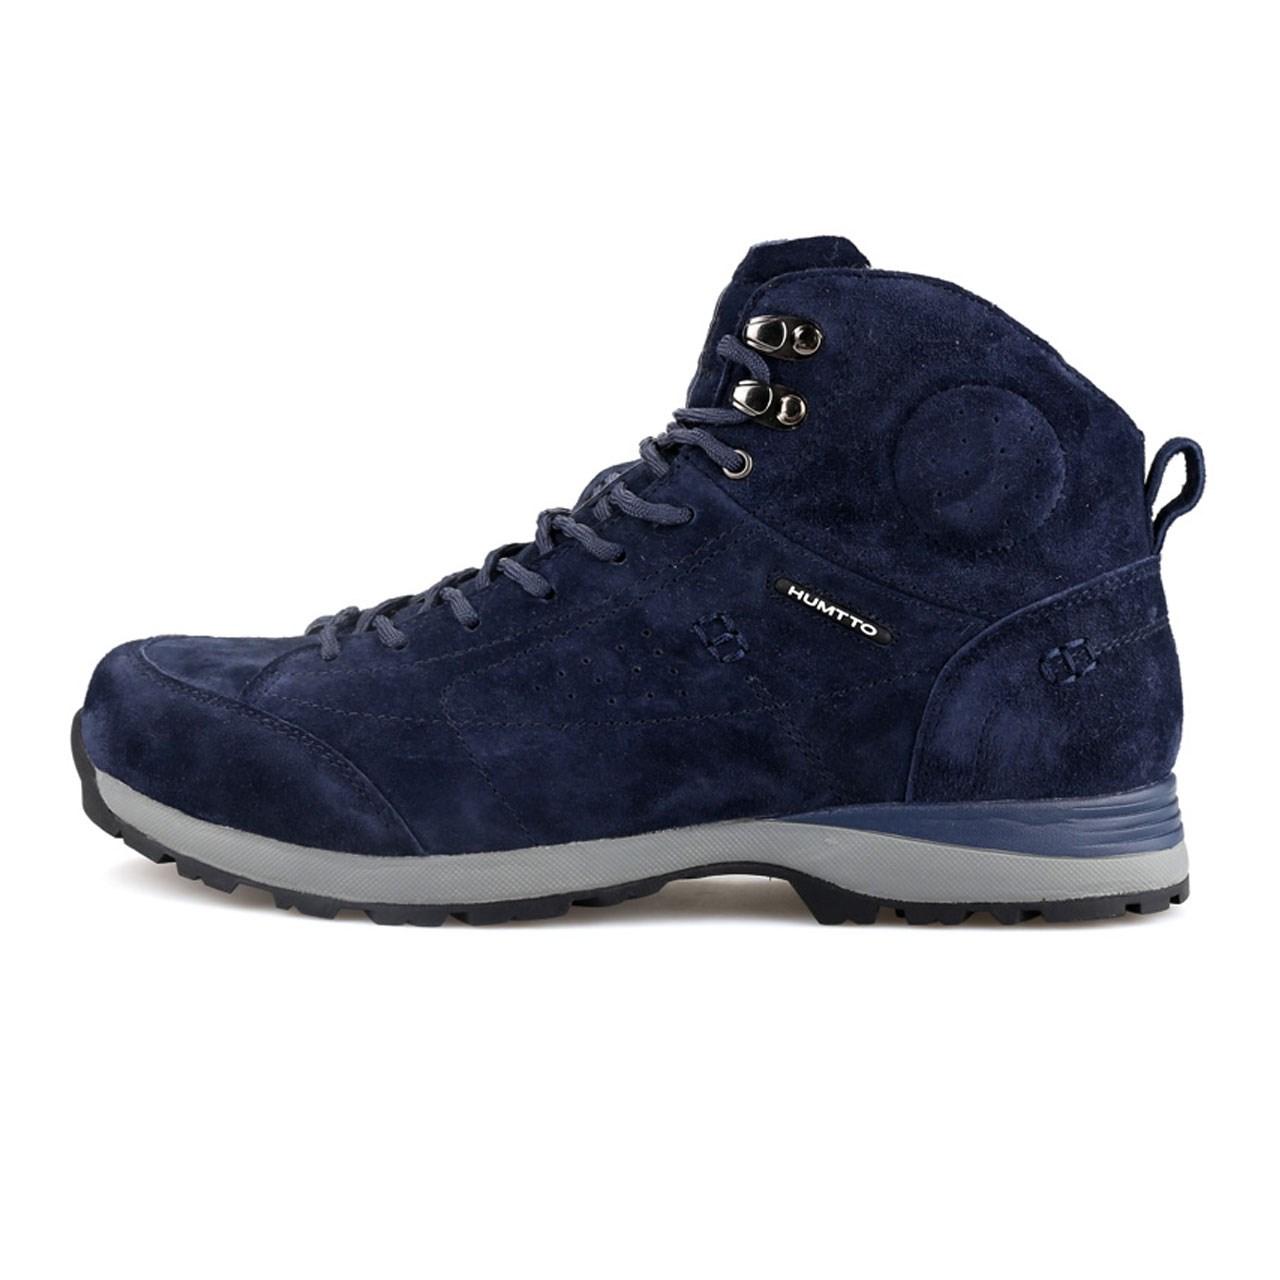 قیمت کفش کوهنوردی هامتو مدل 1-756615